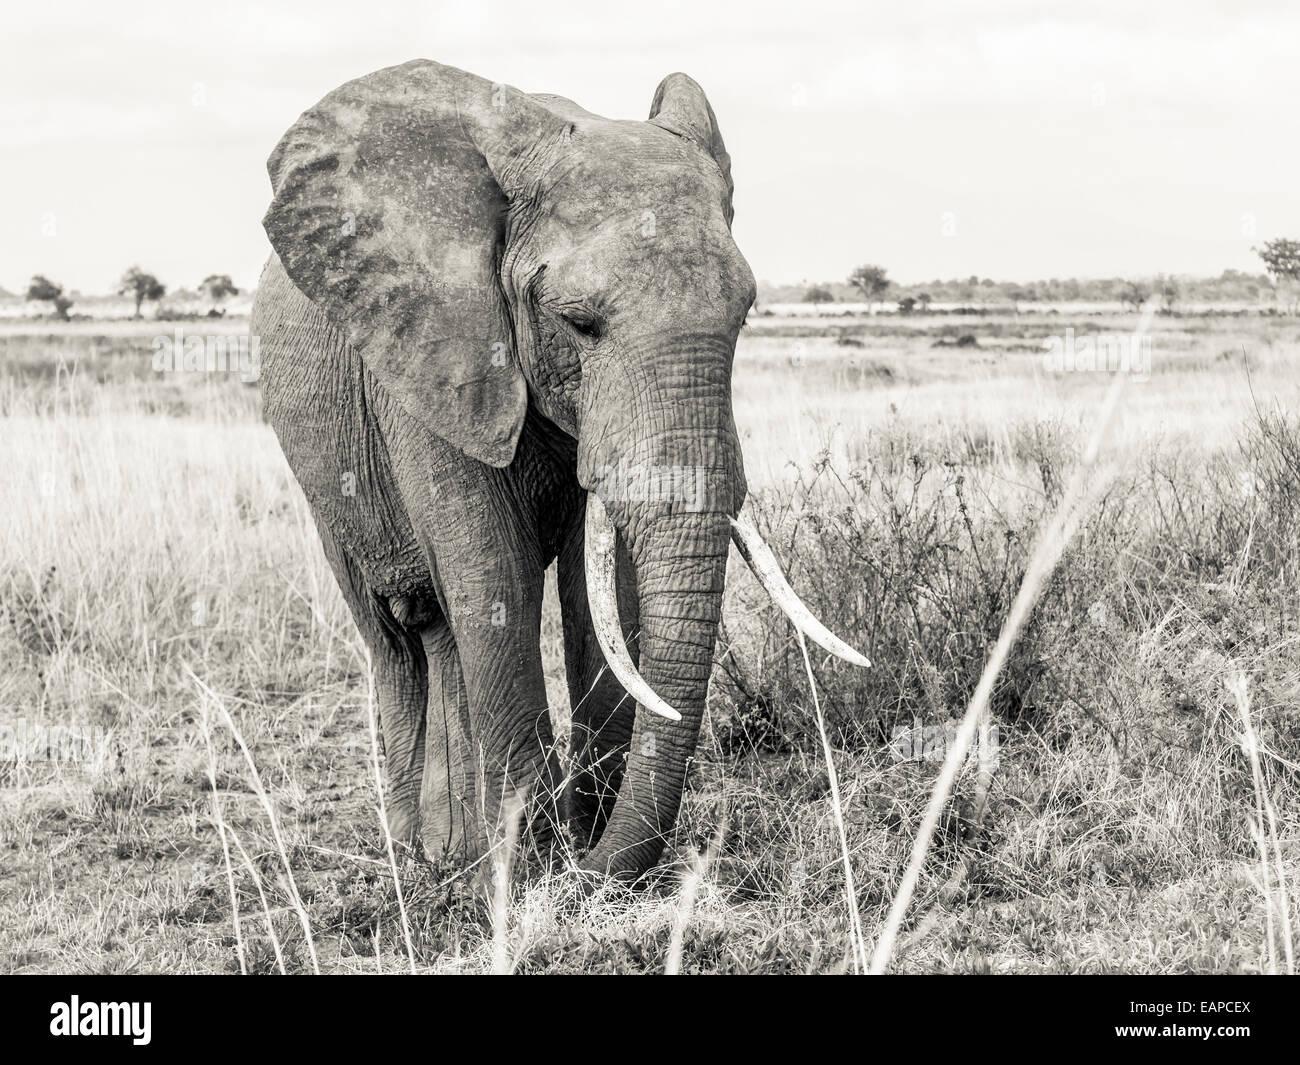 Male elephant on the savanna in Tanzania, Africa. - Stock Image